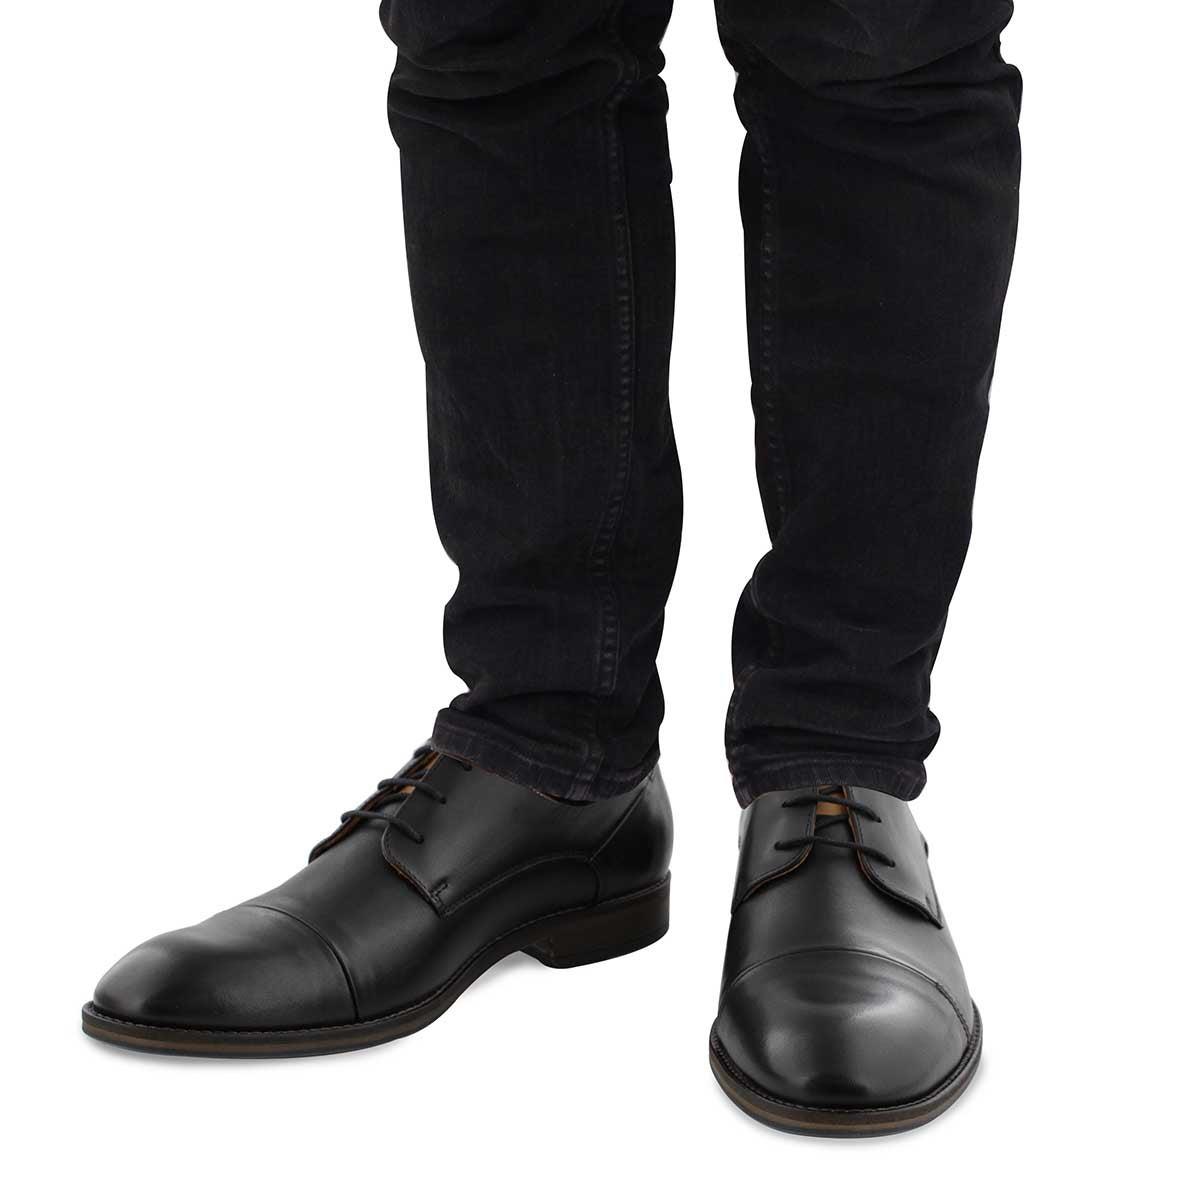 Men's Nielsen Dress Shoe - Black